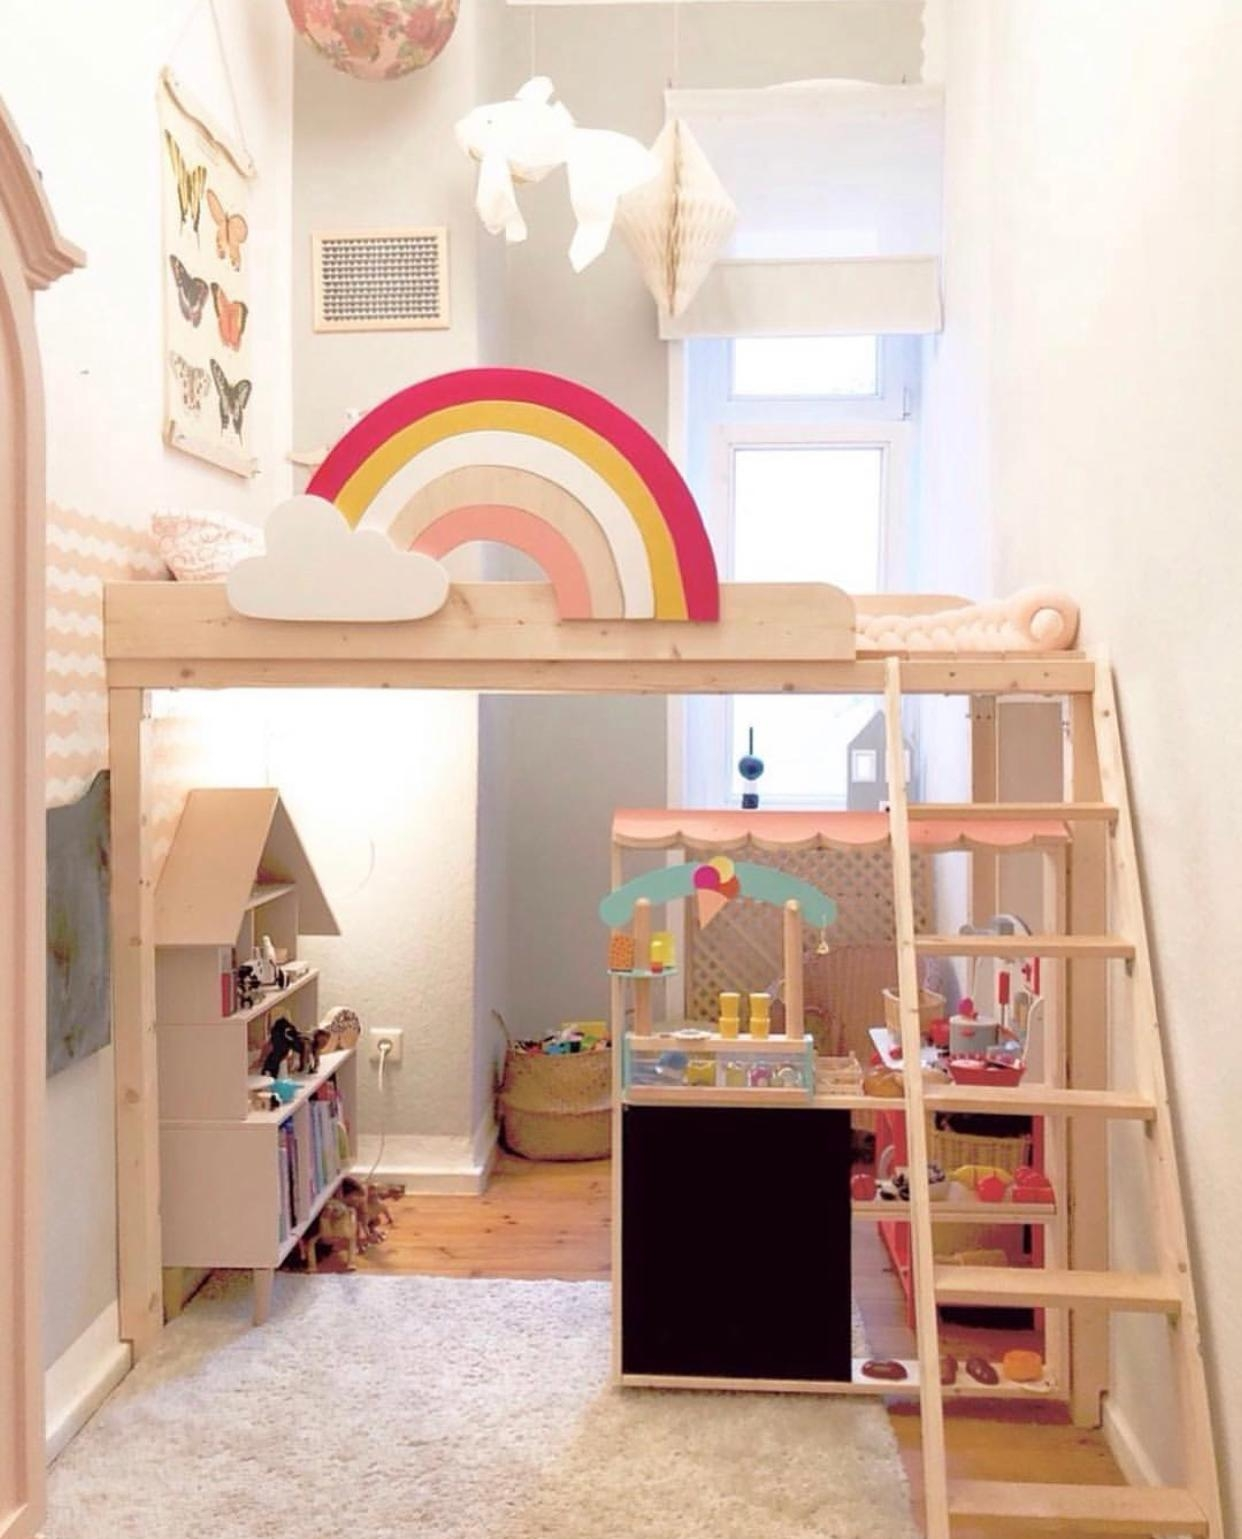 Full Size of Hochbetten Kinderzimmer Regenbogen Hochbett Diy Altbau Be Regale Regal Weiß Sofa Kinderzimmer Hochbetten Kinderzimmer